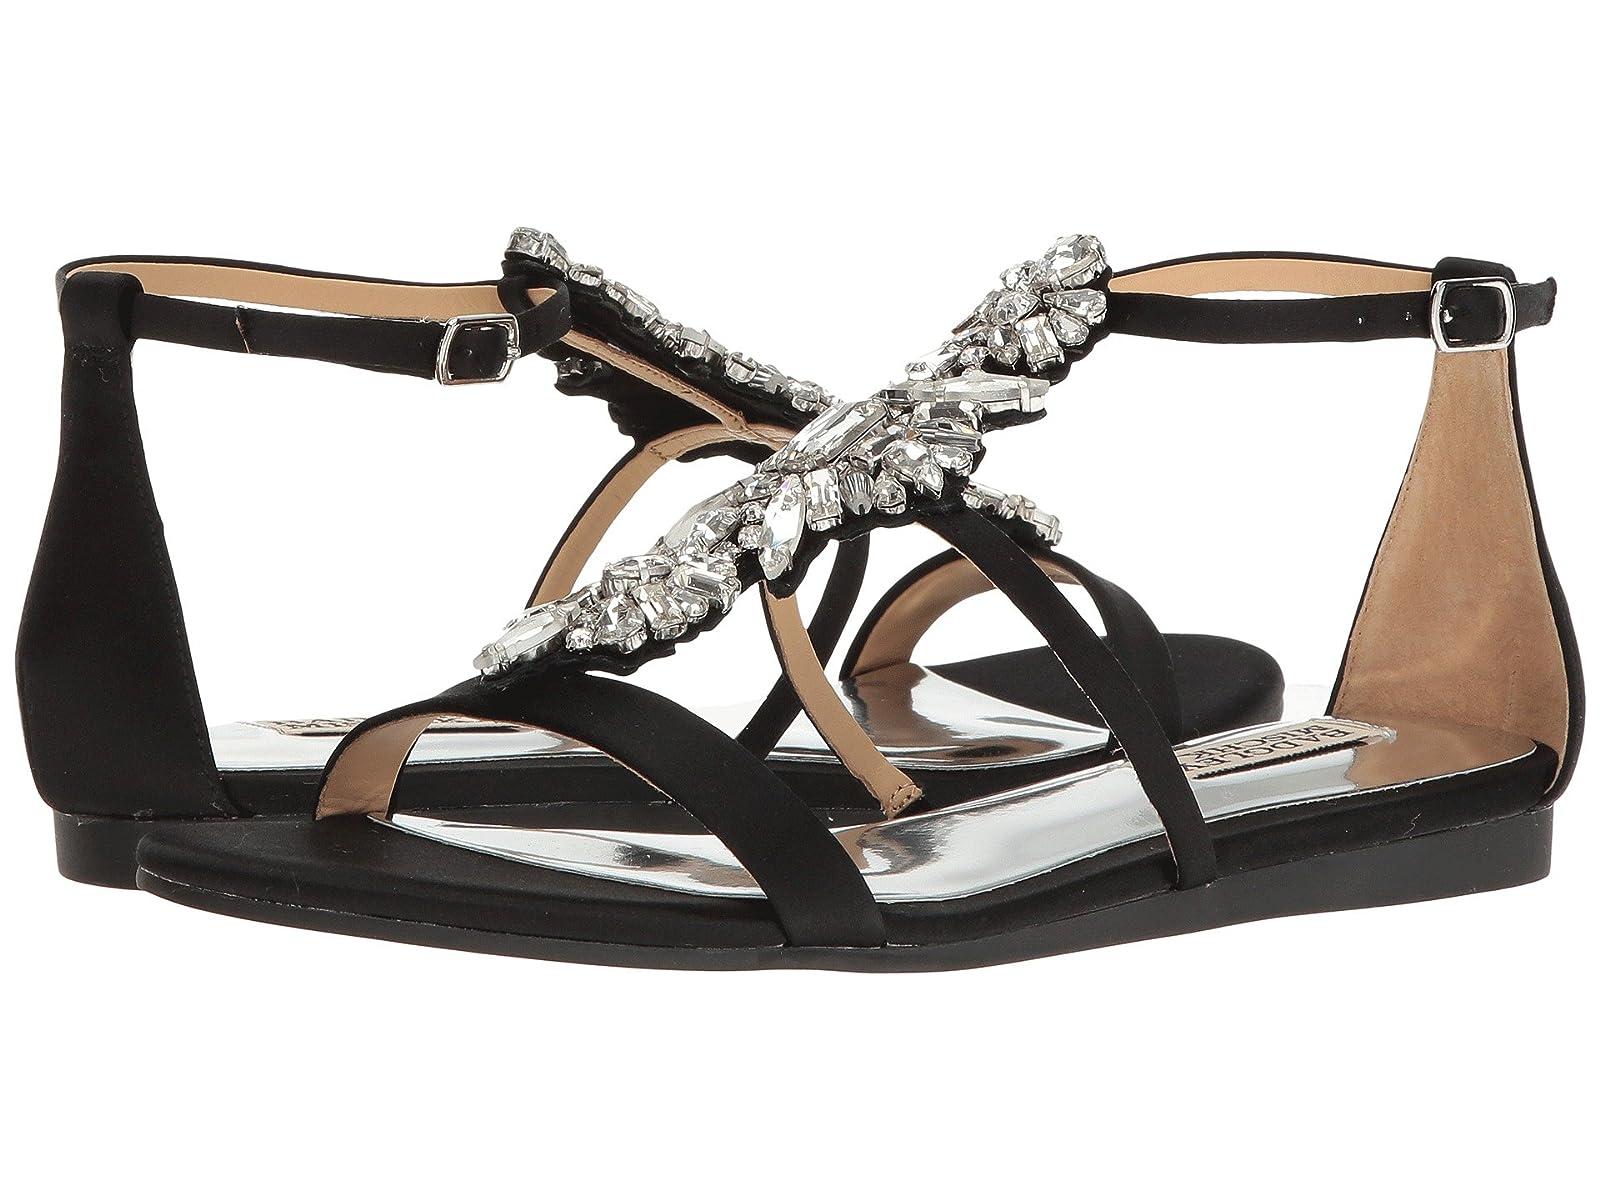 Badgley Mischka BarstowCheap and distinctive eye-catching shoes